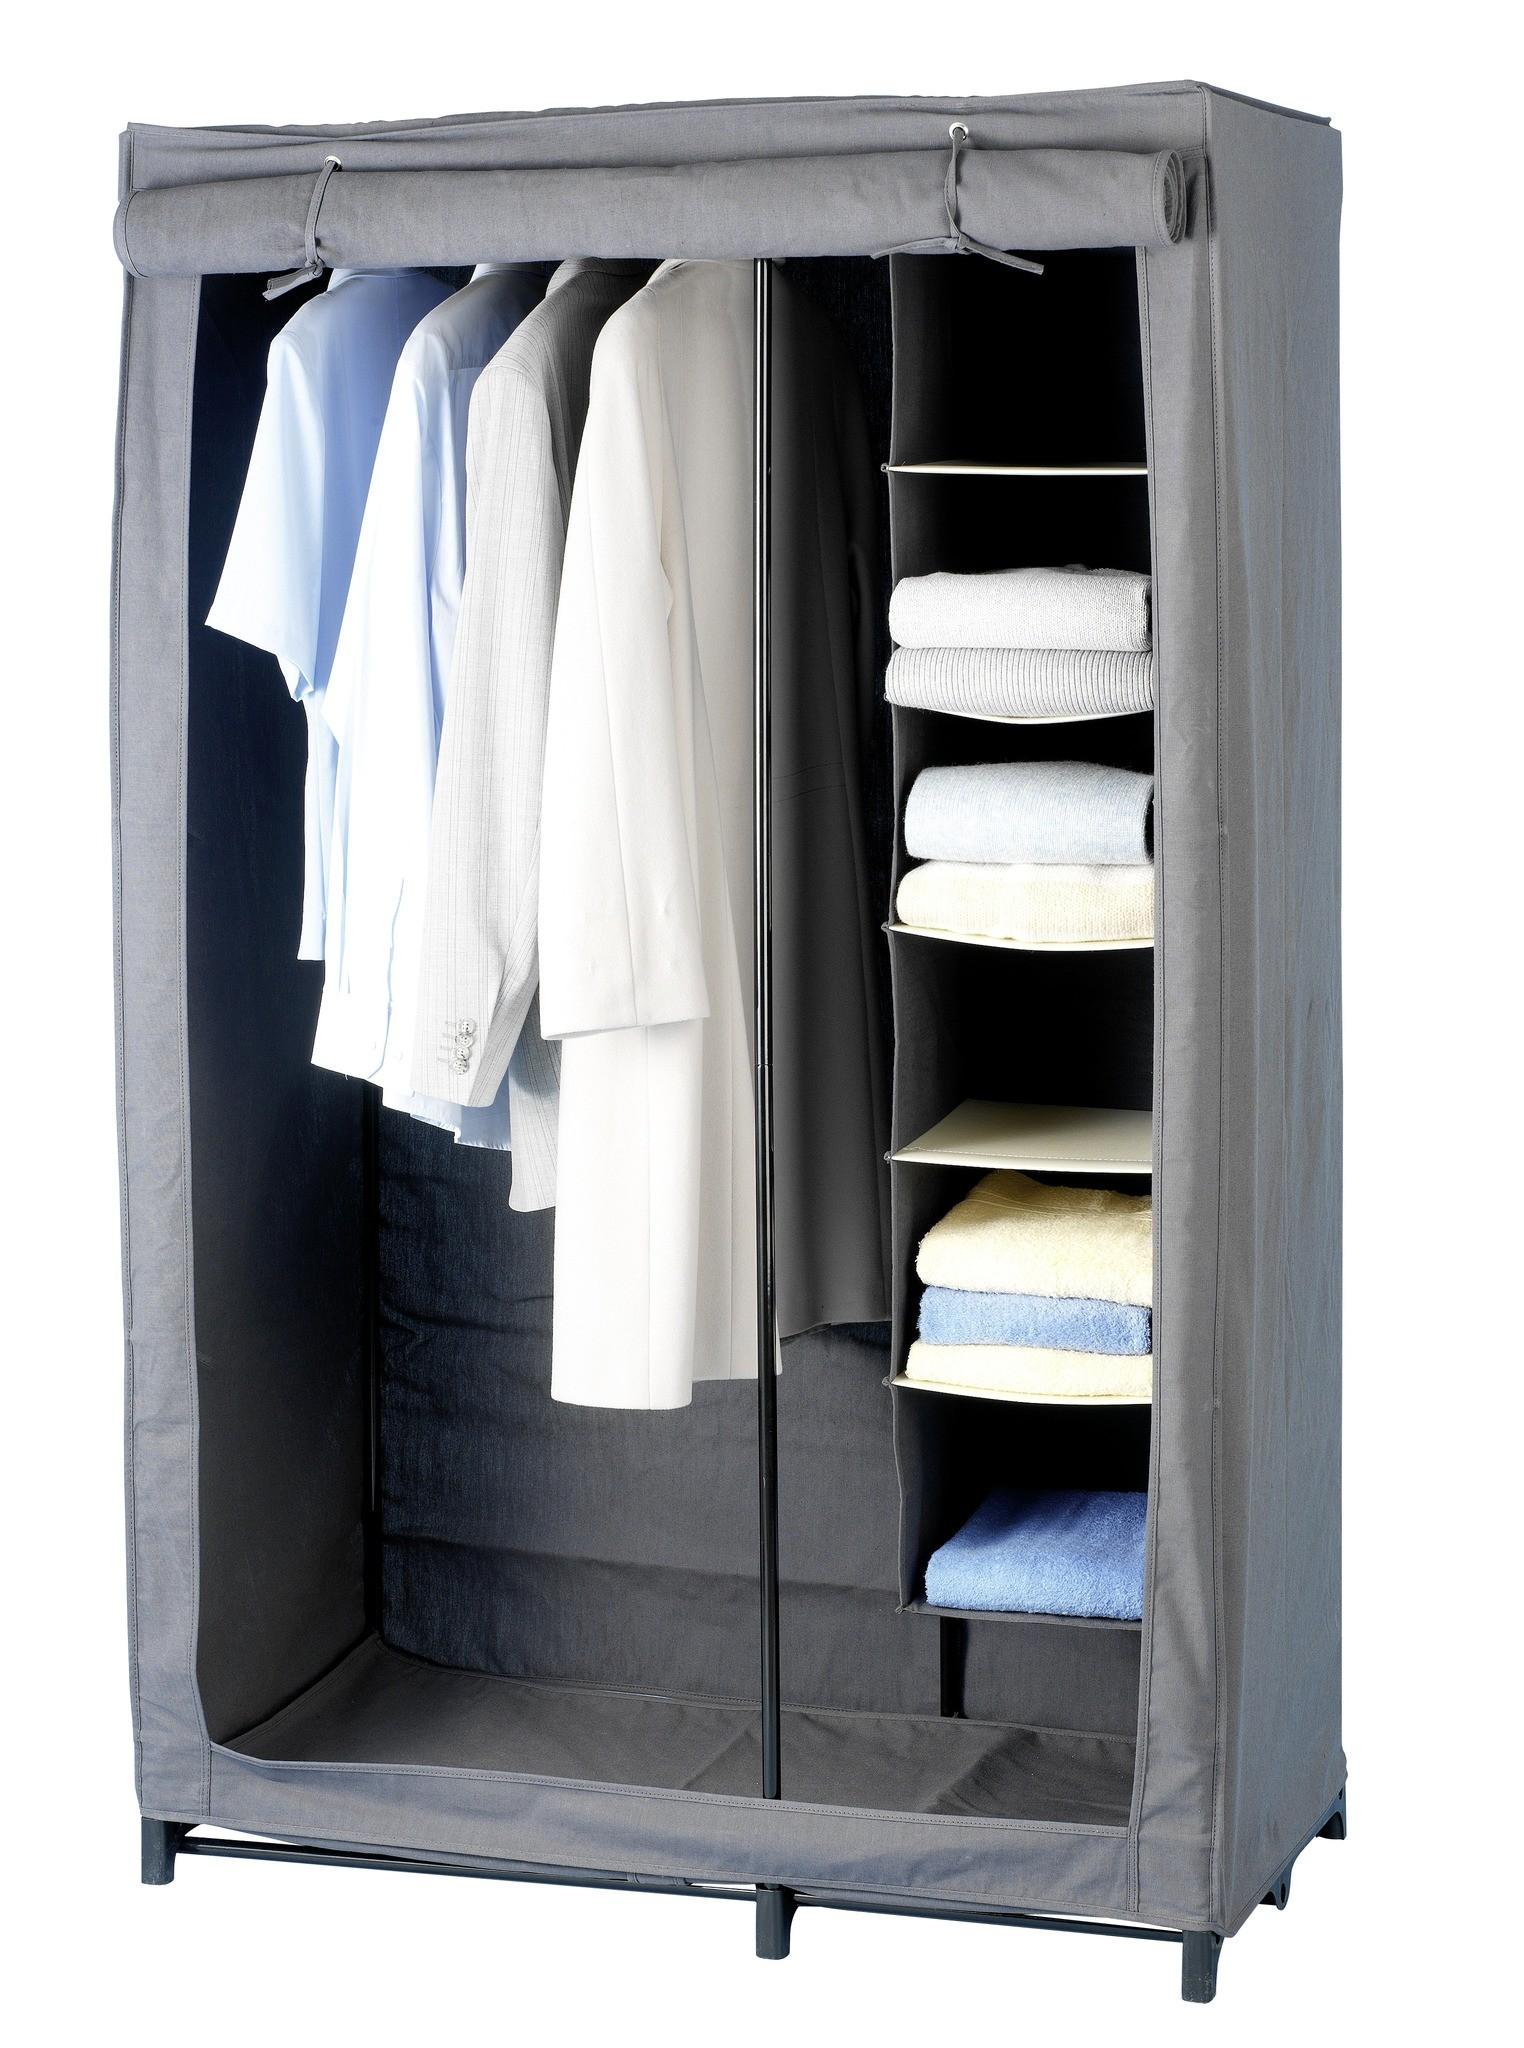 Kleiderschrank Libertà inklusive Wäschesortierer